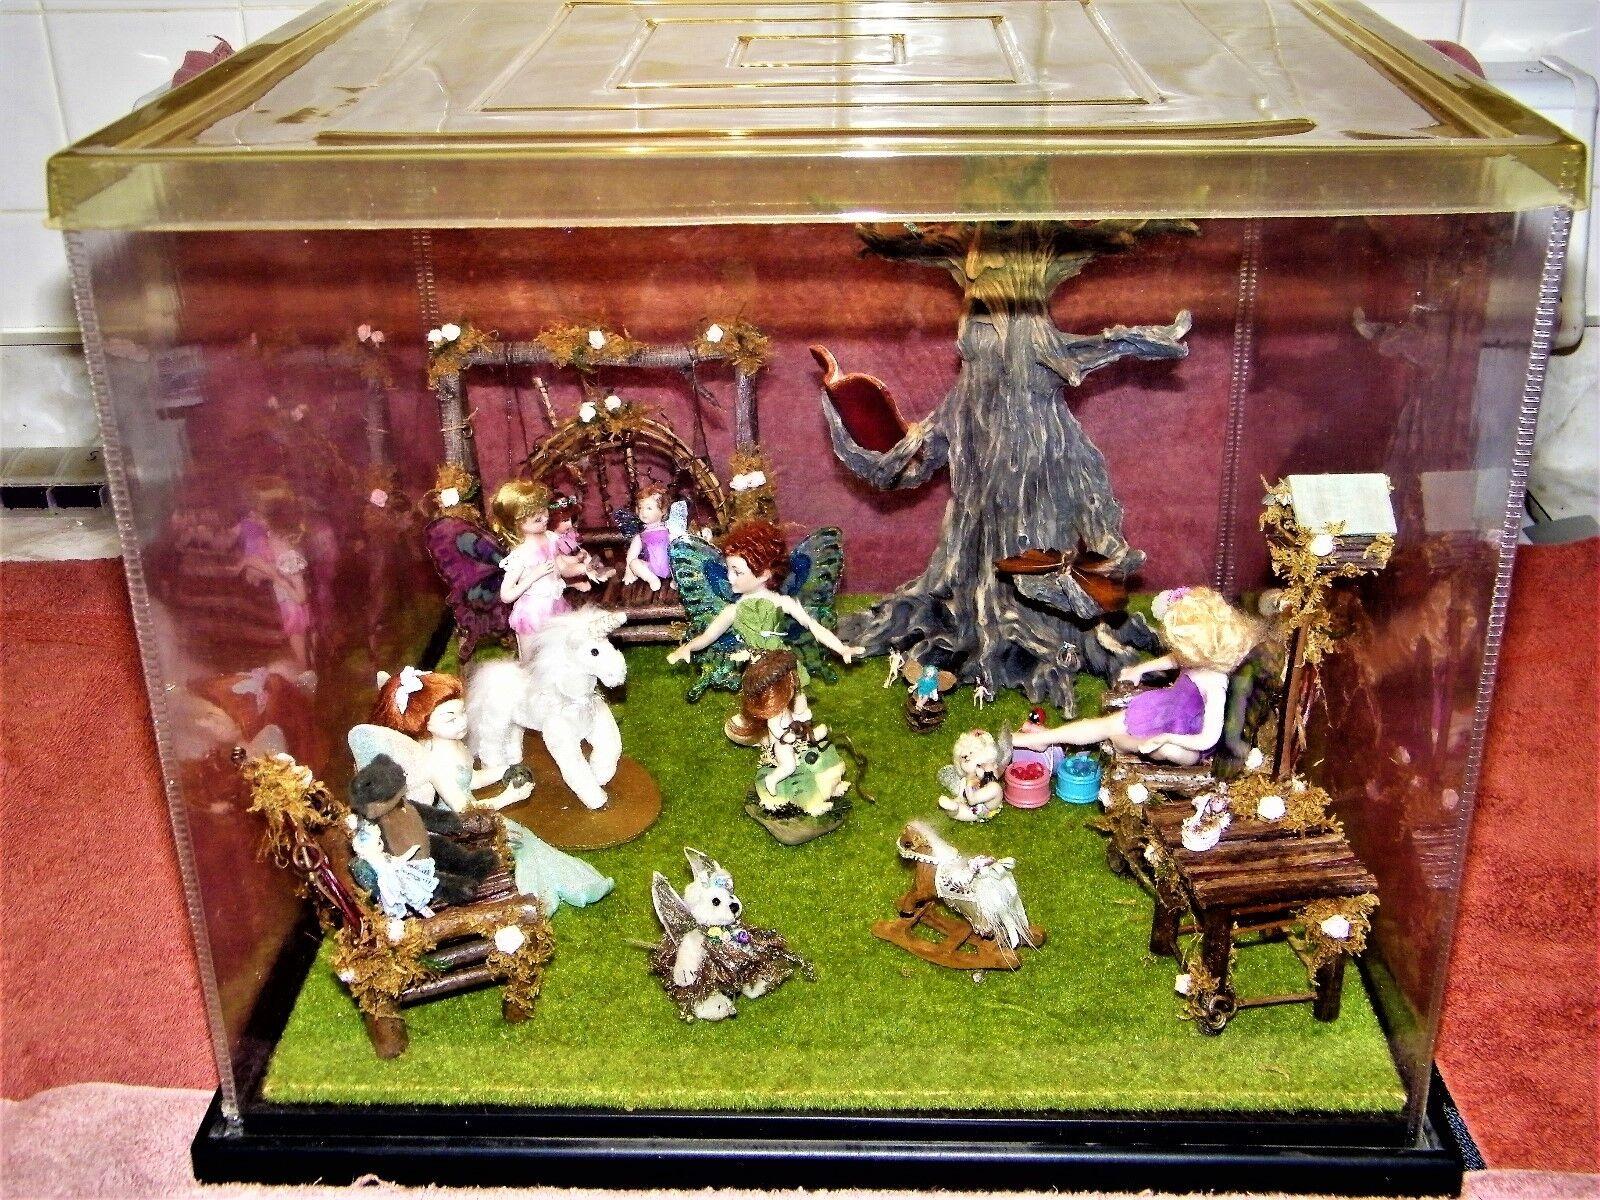 saldi Minature Display, OOAK,     Fairy Le  ,  Wood Furniture He fatto,  30 years old  spedizione veloce a te